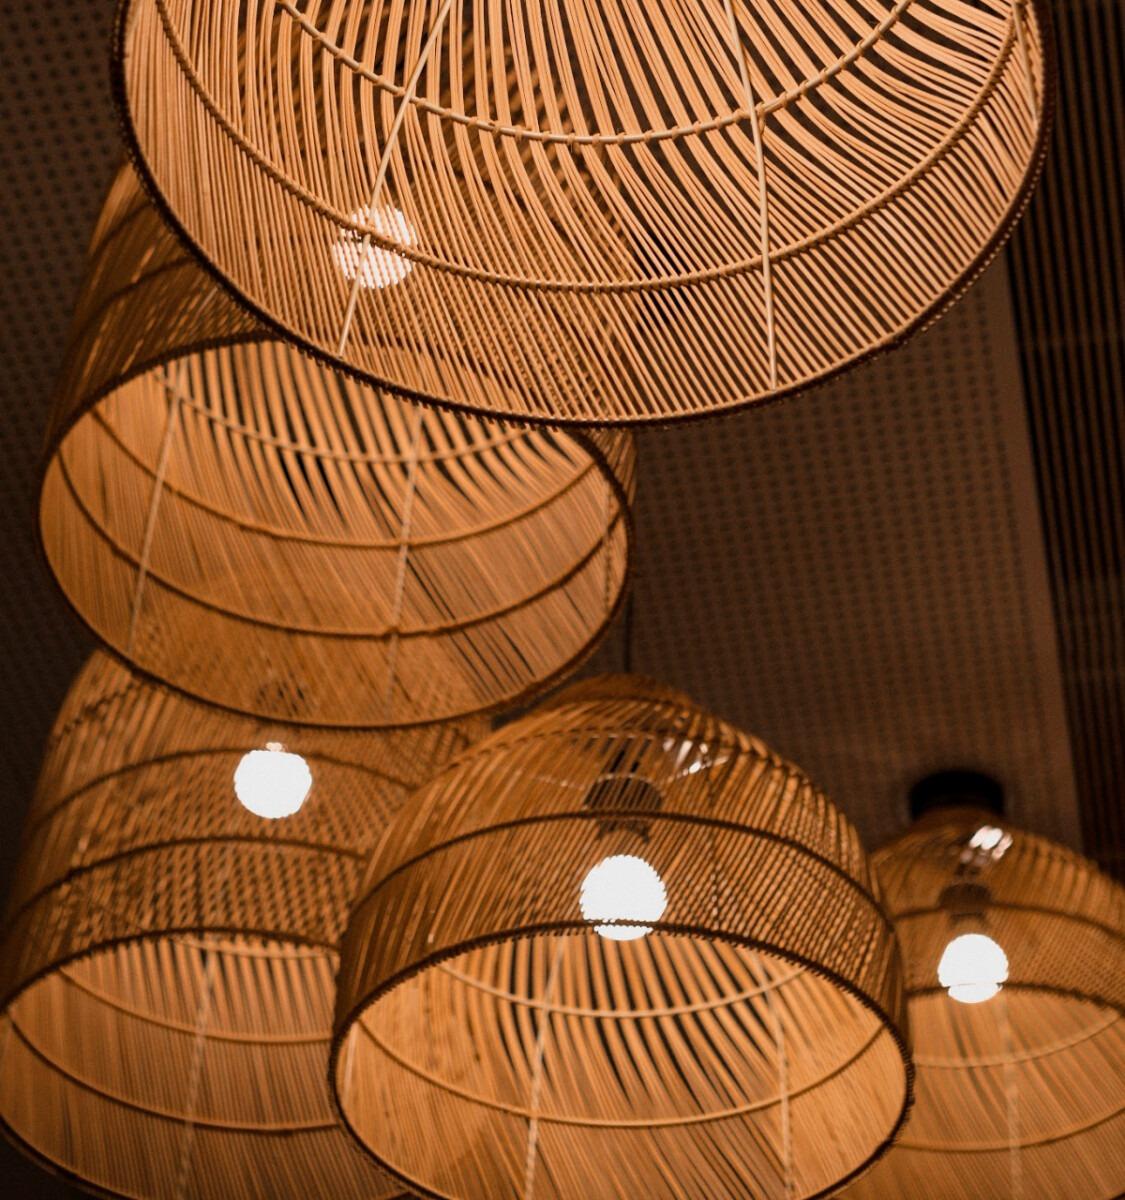 houten lampen, hout, riet, bamboe, verlichting